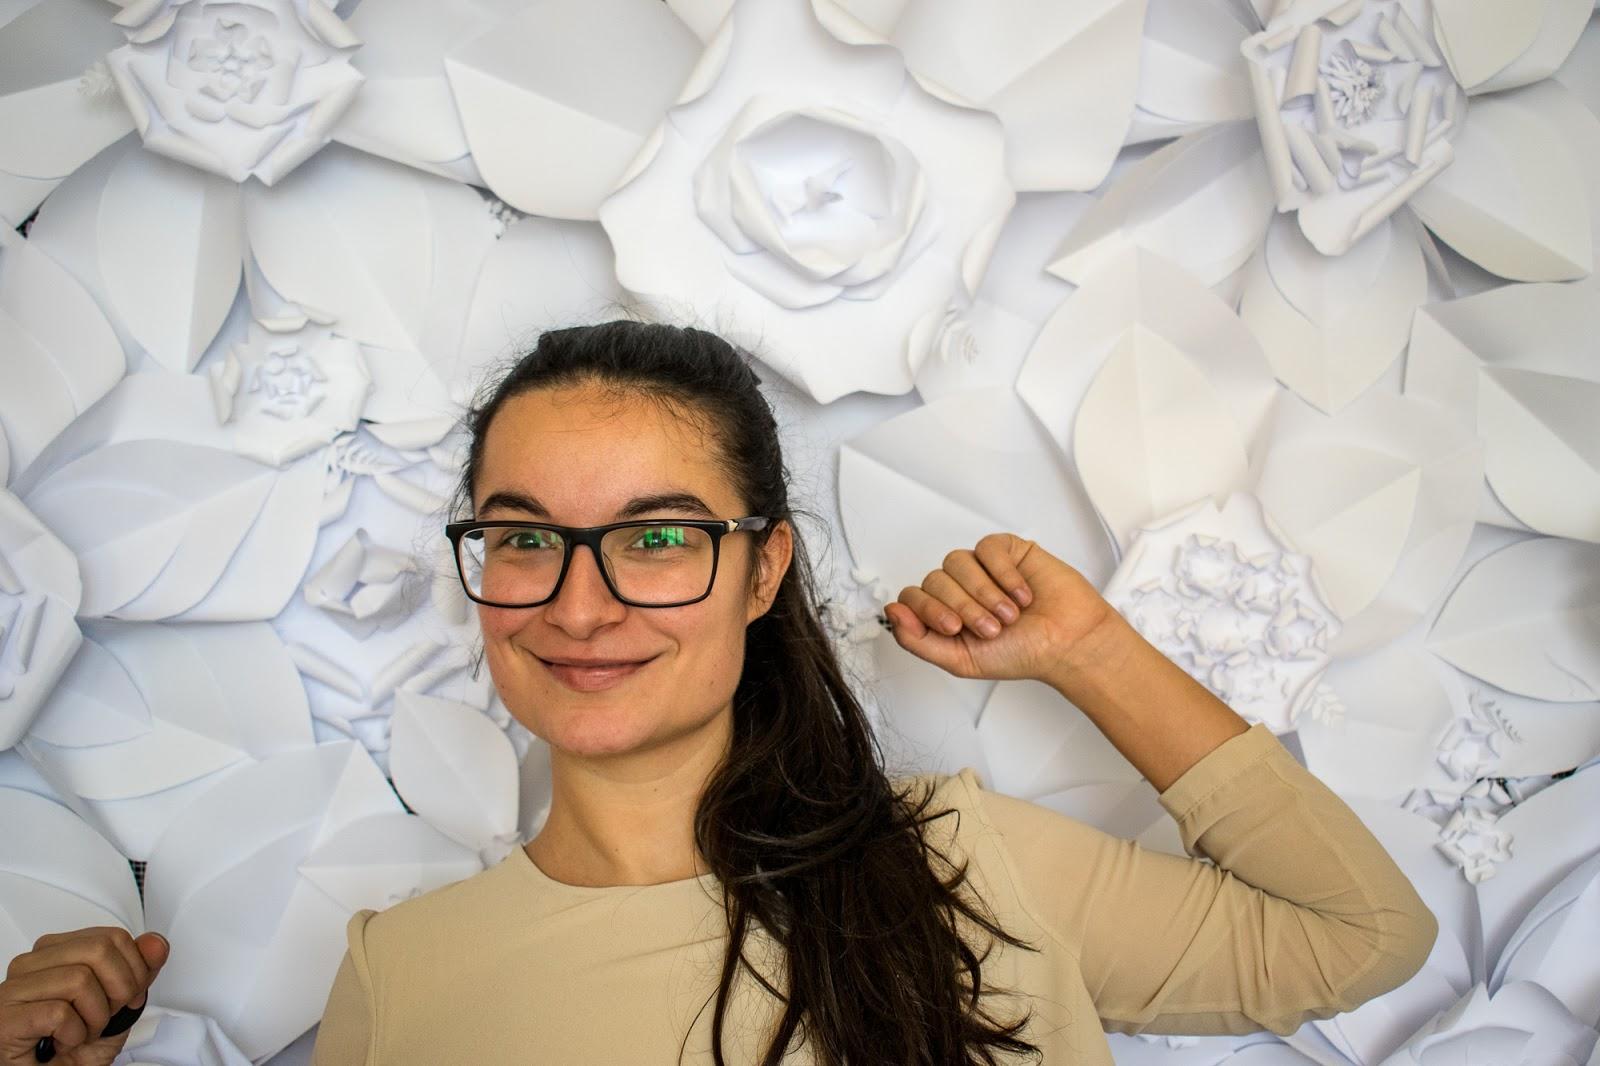 Portret Perete cu Flori de Hartie Handmade pentru Cabina Foto de Inchiriat - Amintiri Magice